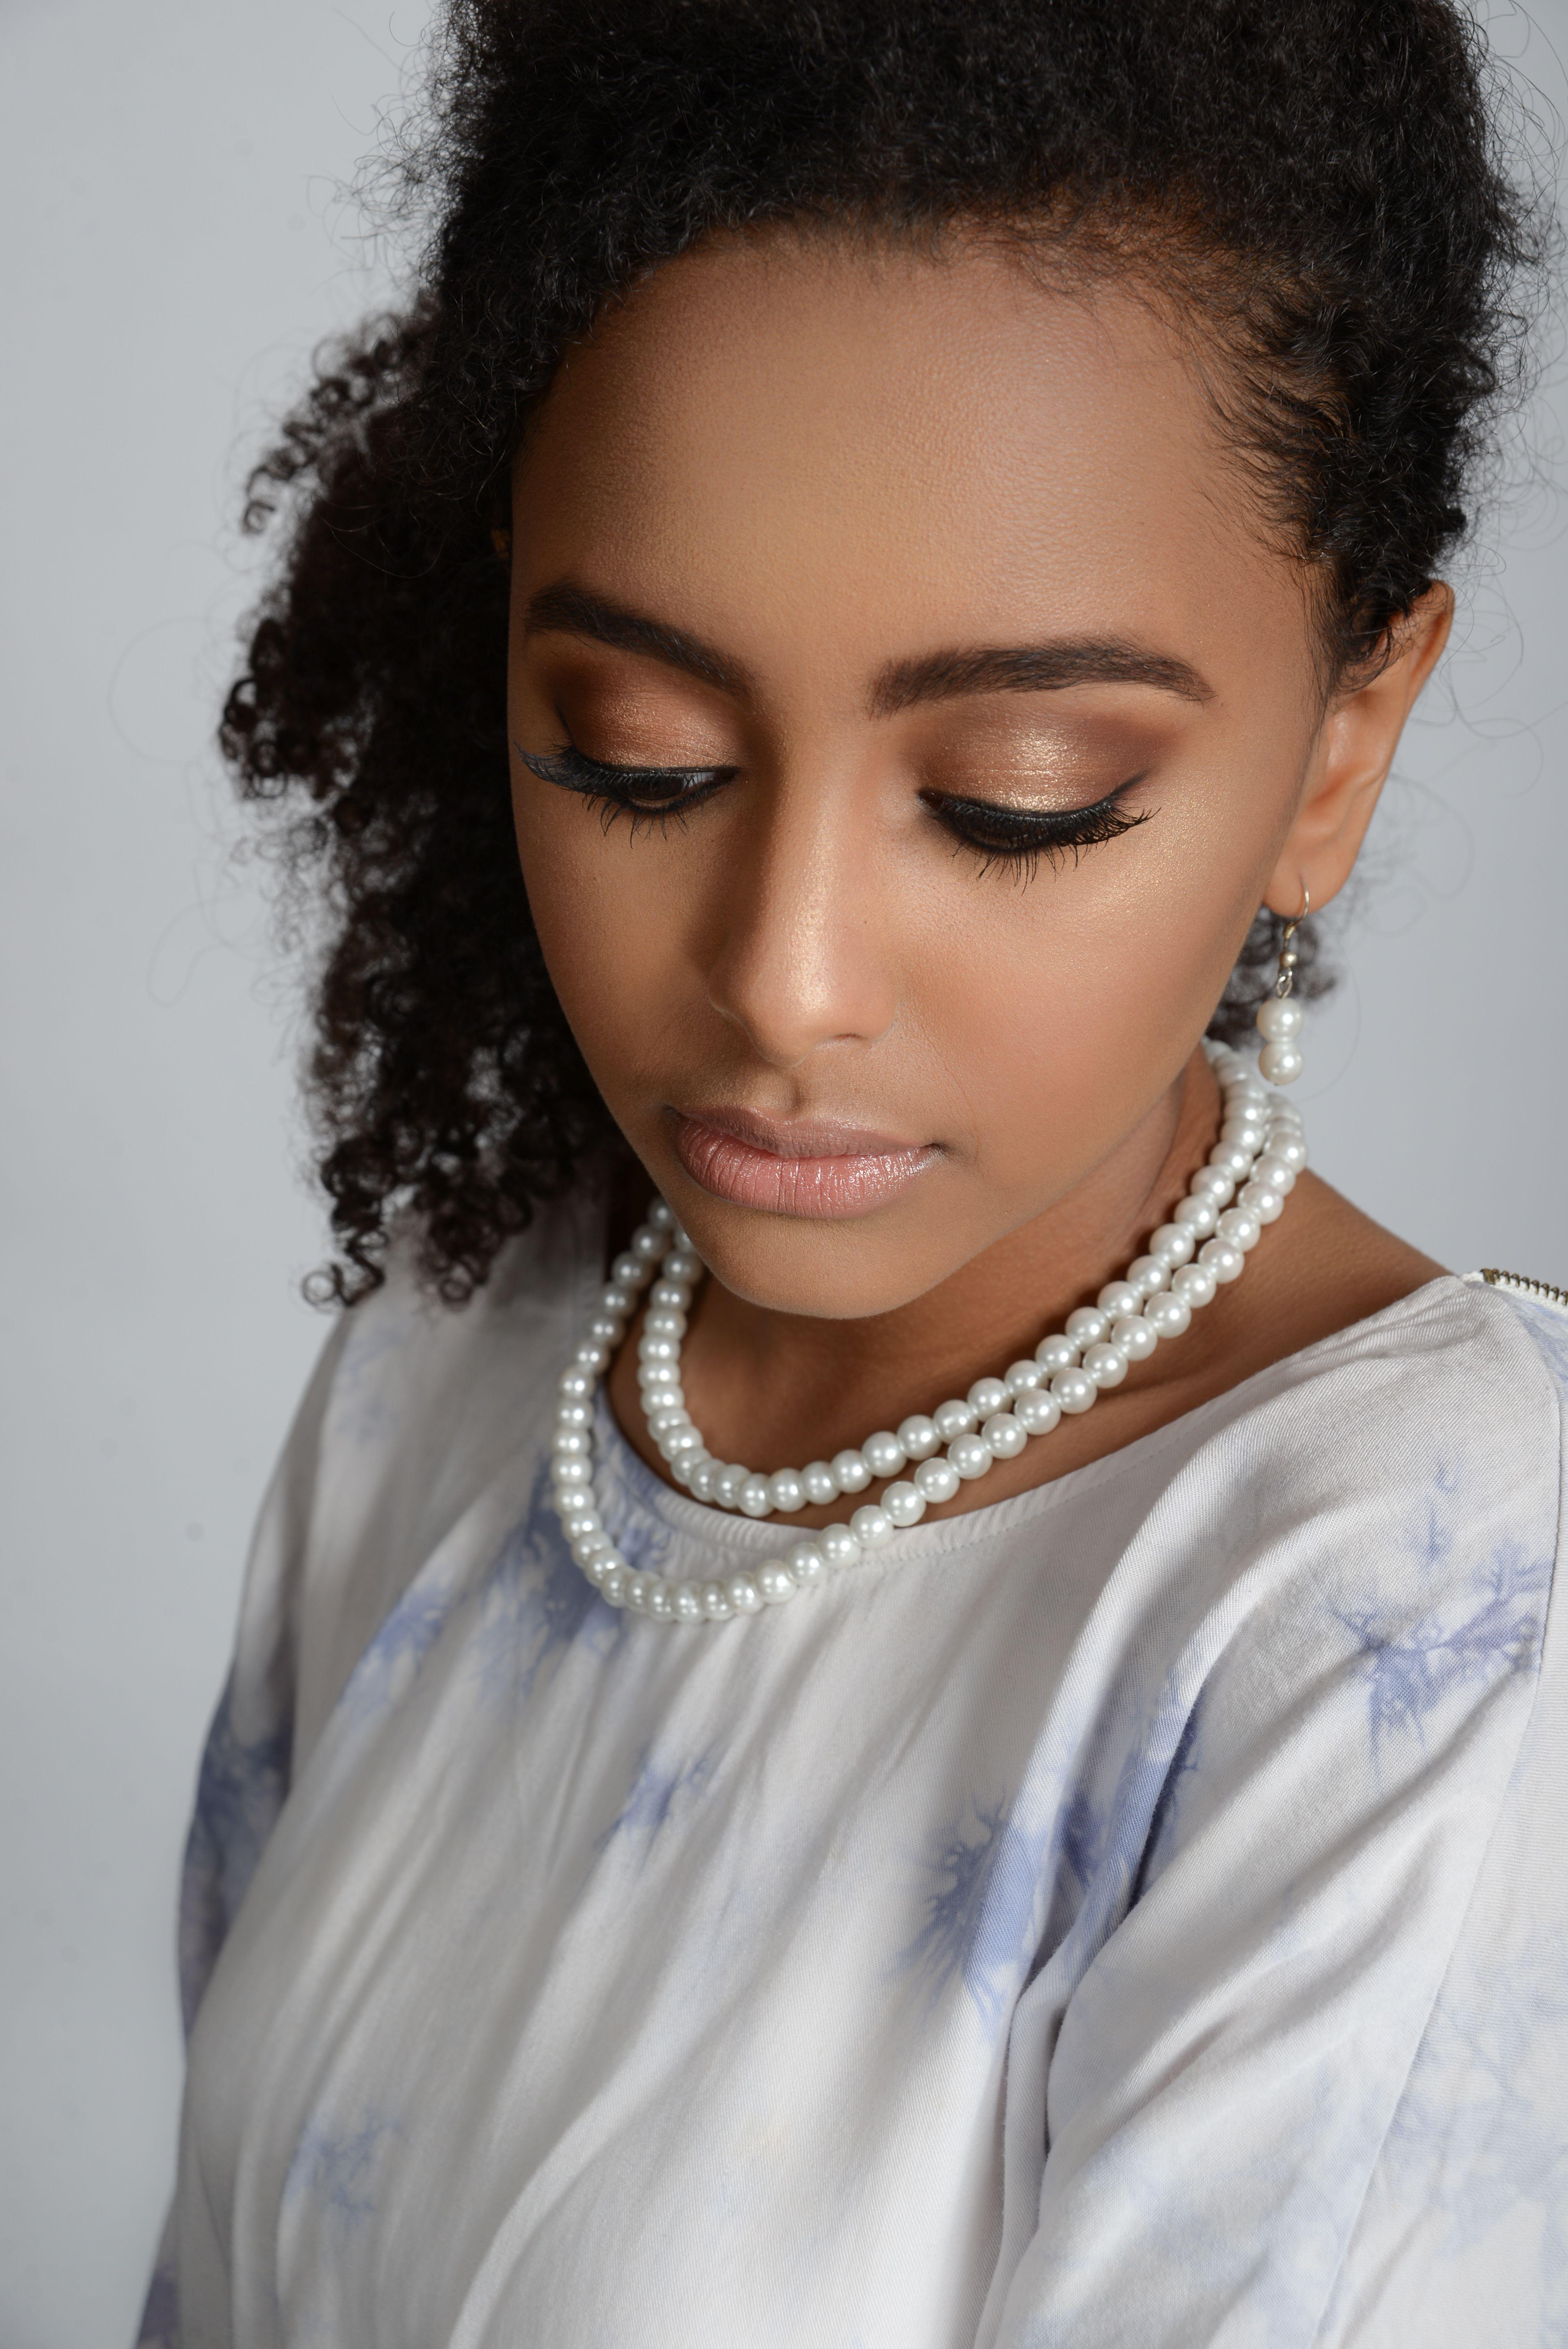 Beauty, Bridal and Glamour makeup classes at CMC Makeup